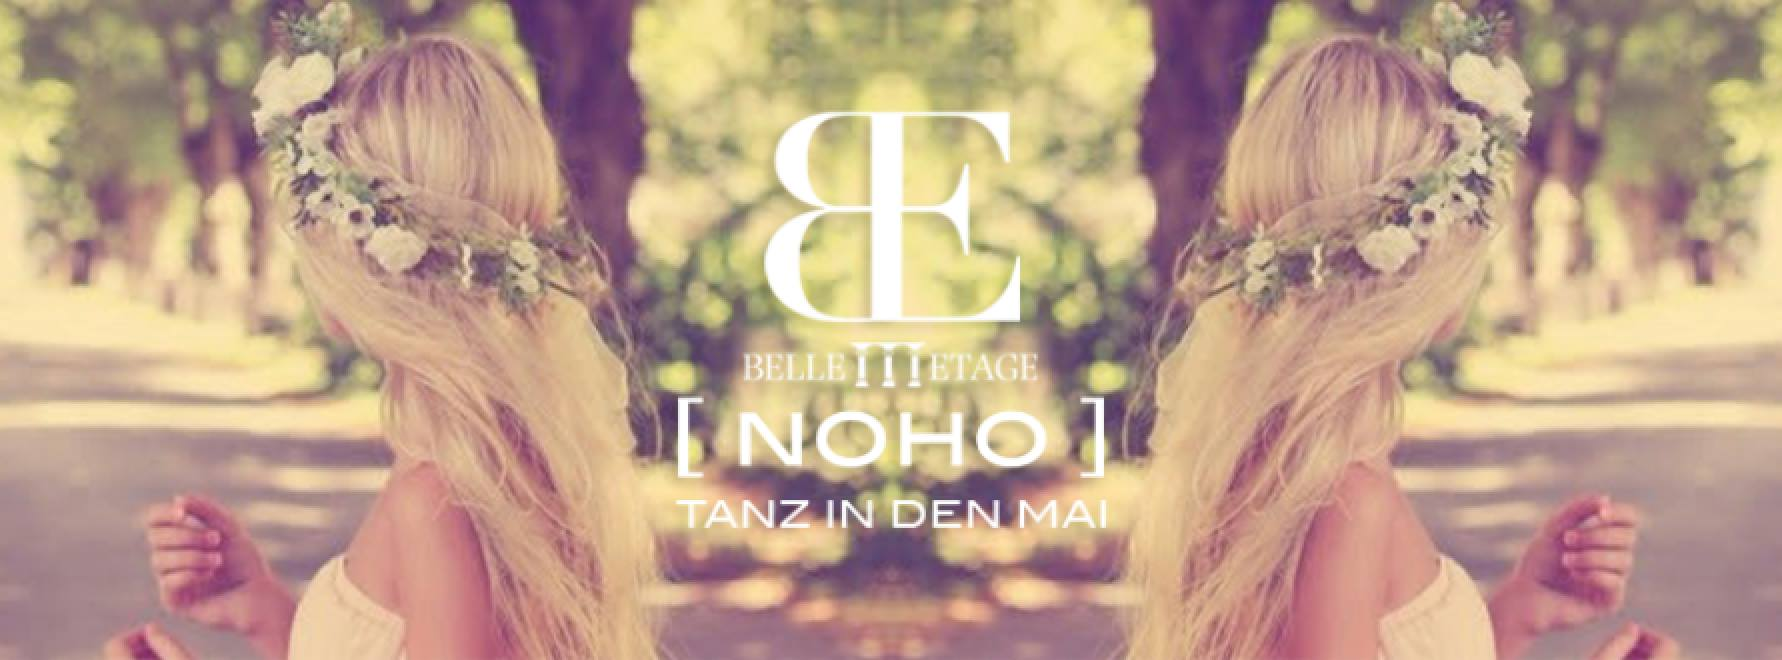 tanz-in-den-mai-noho